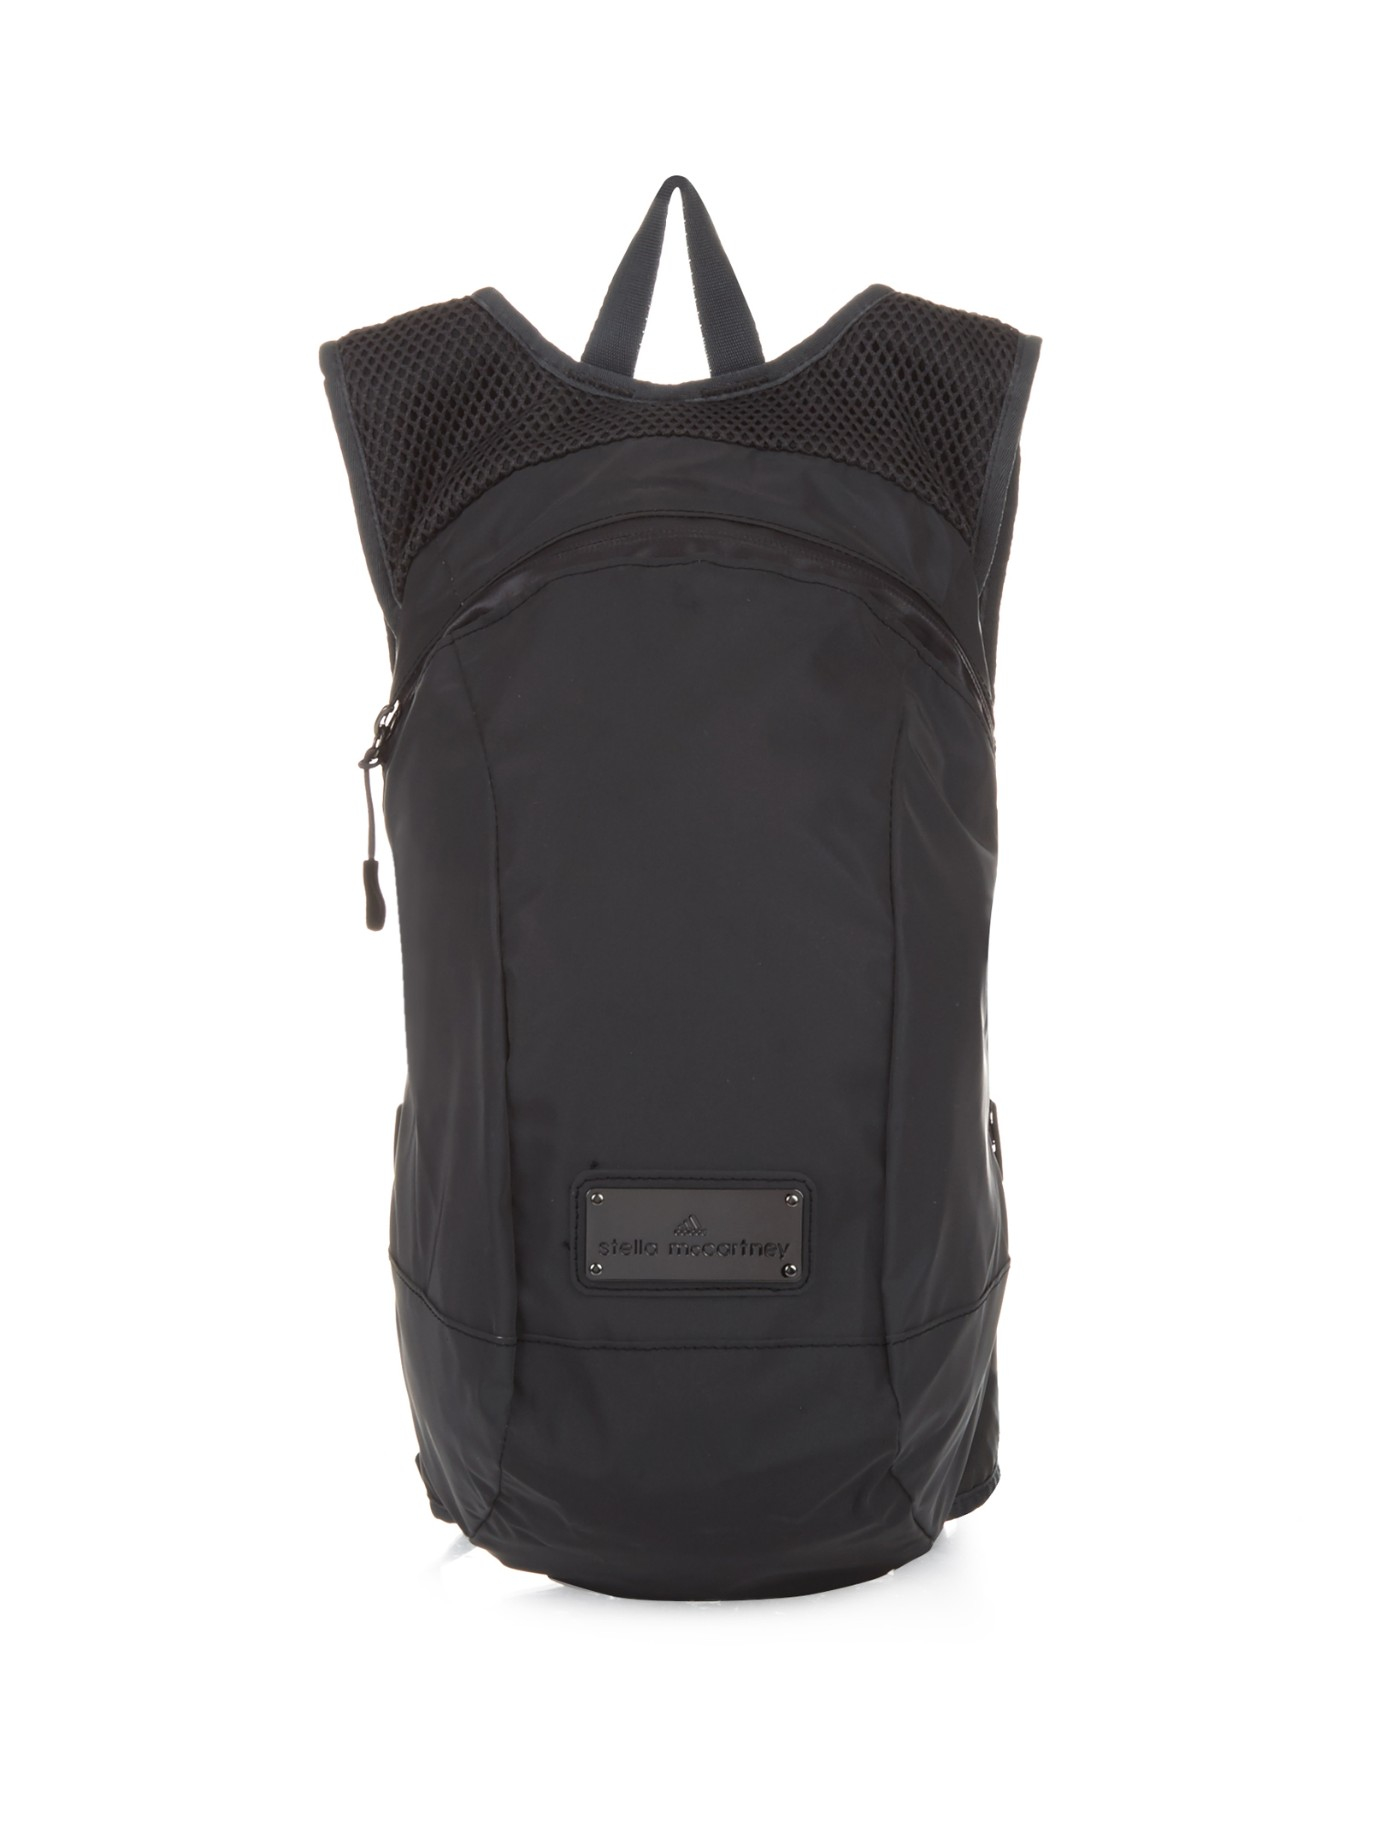 adidas by stella mccartney running backpack in black lyst. Black Bedroom Furniture Sets. Home Design Ideas